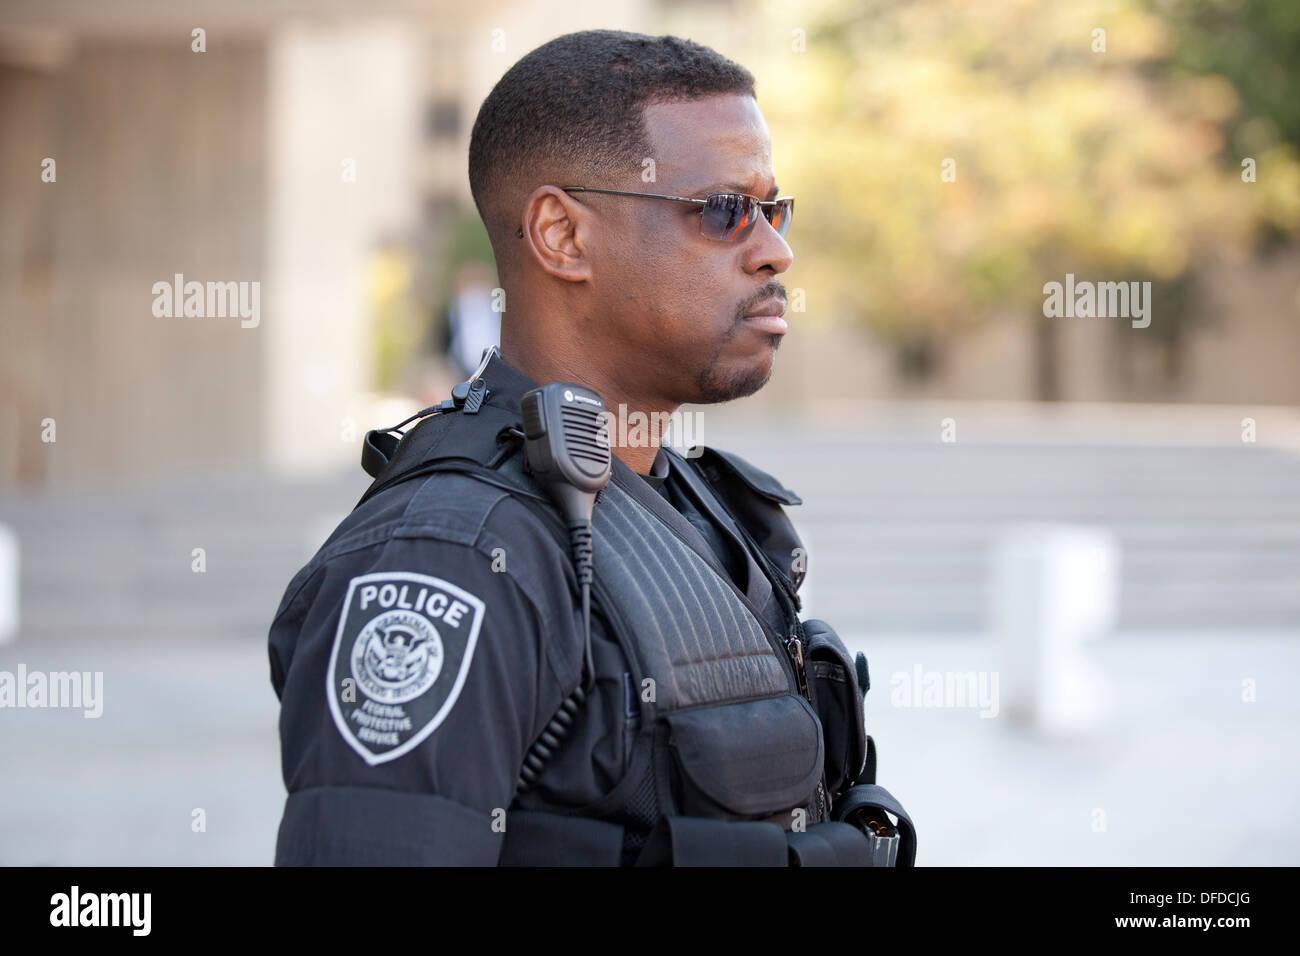 US Homeland Security (Federal Protective Service) policeman - Washington, DC USA - Stock Image